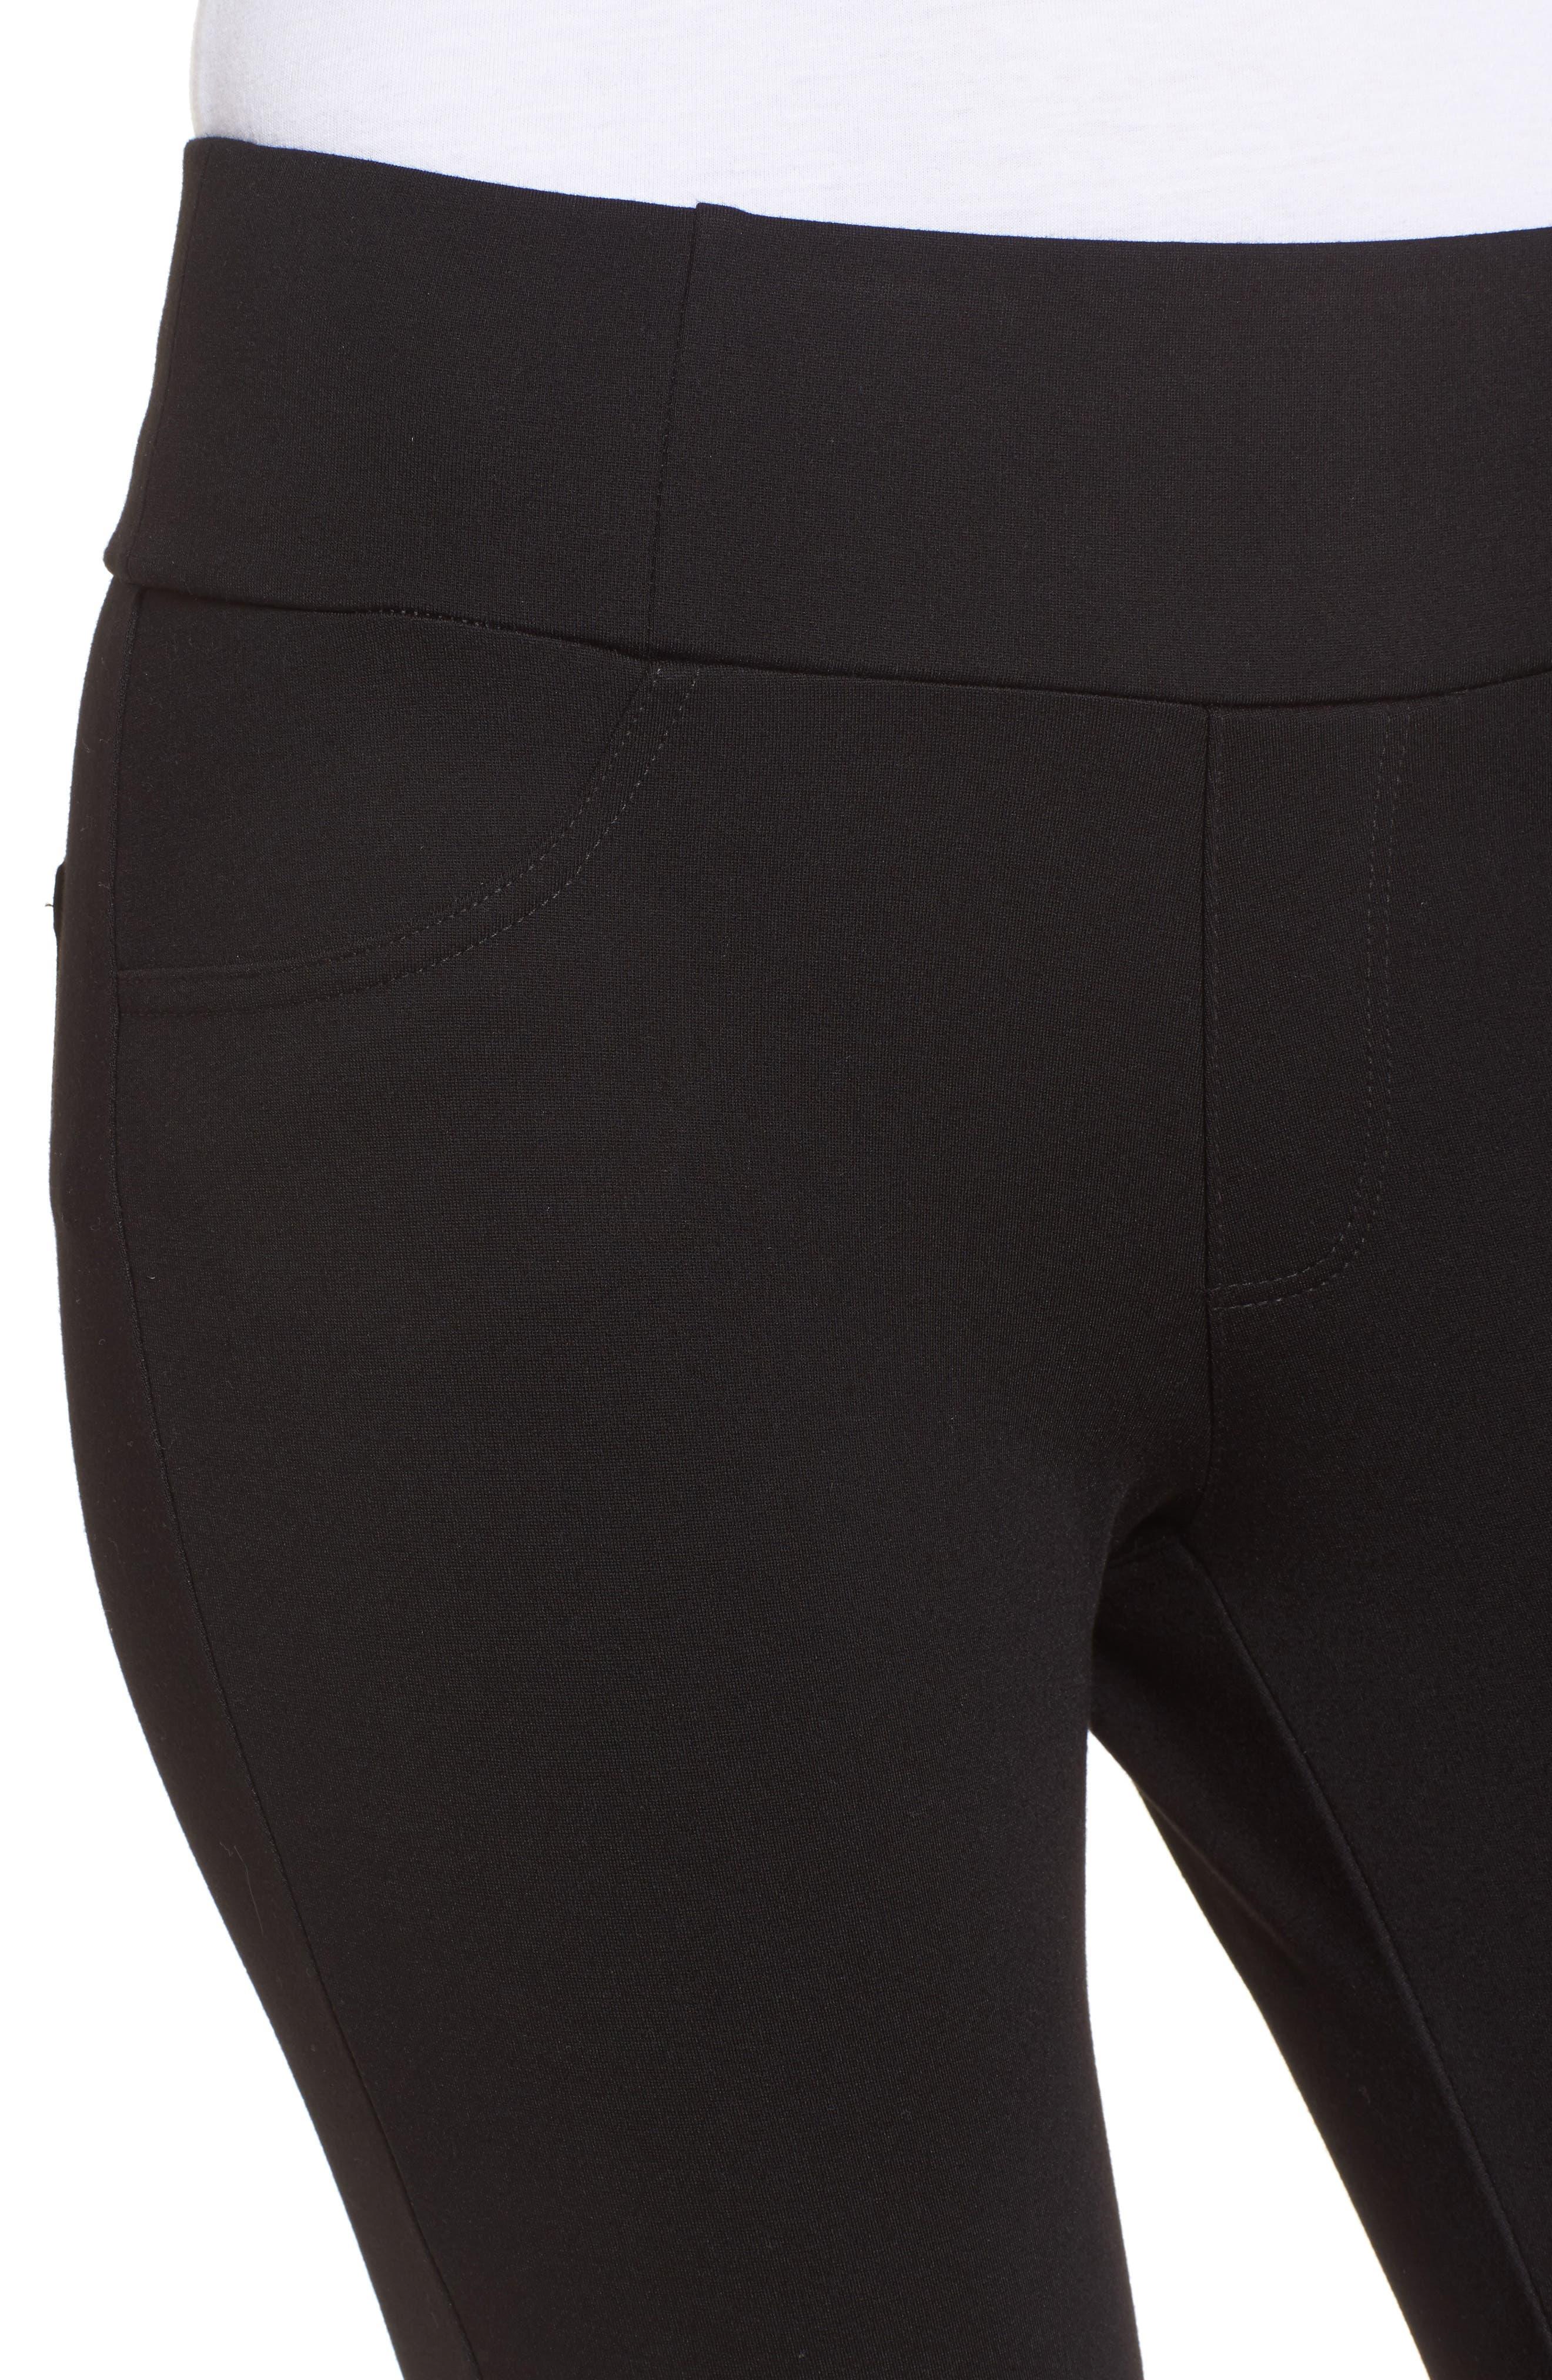 High Waist Ponte Pants,                             Alternate thumbnail 4, color,                             BLACK